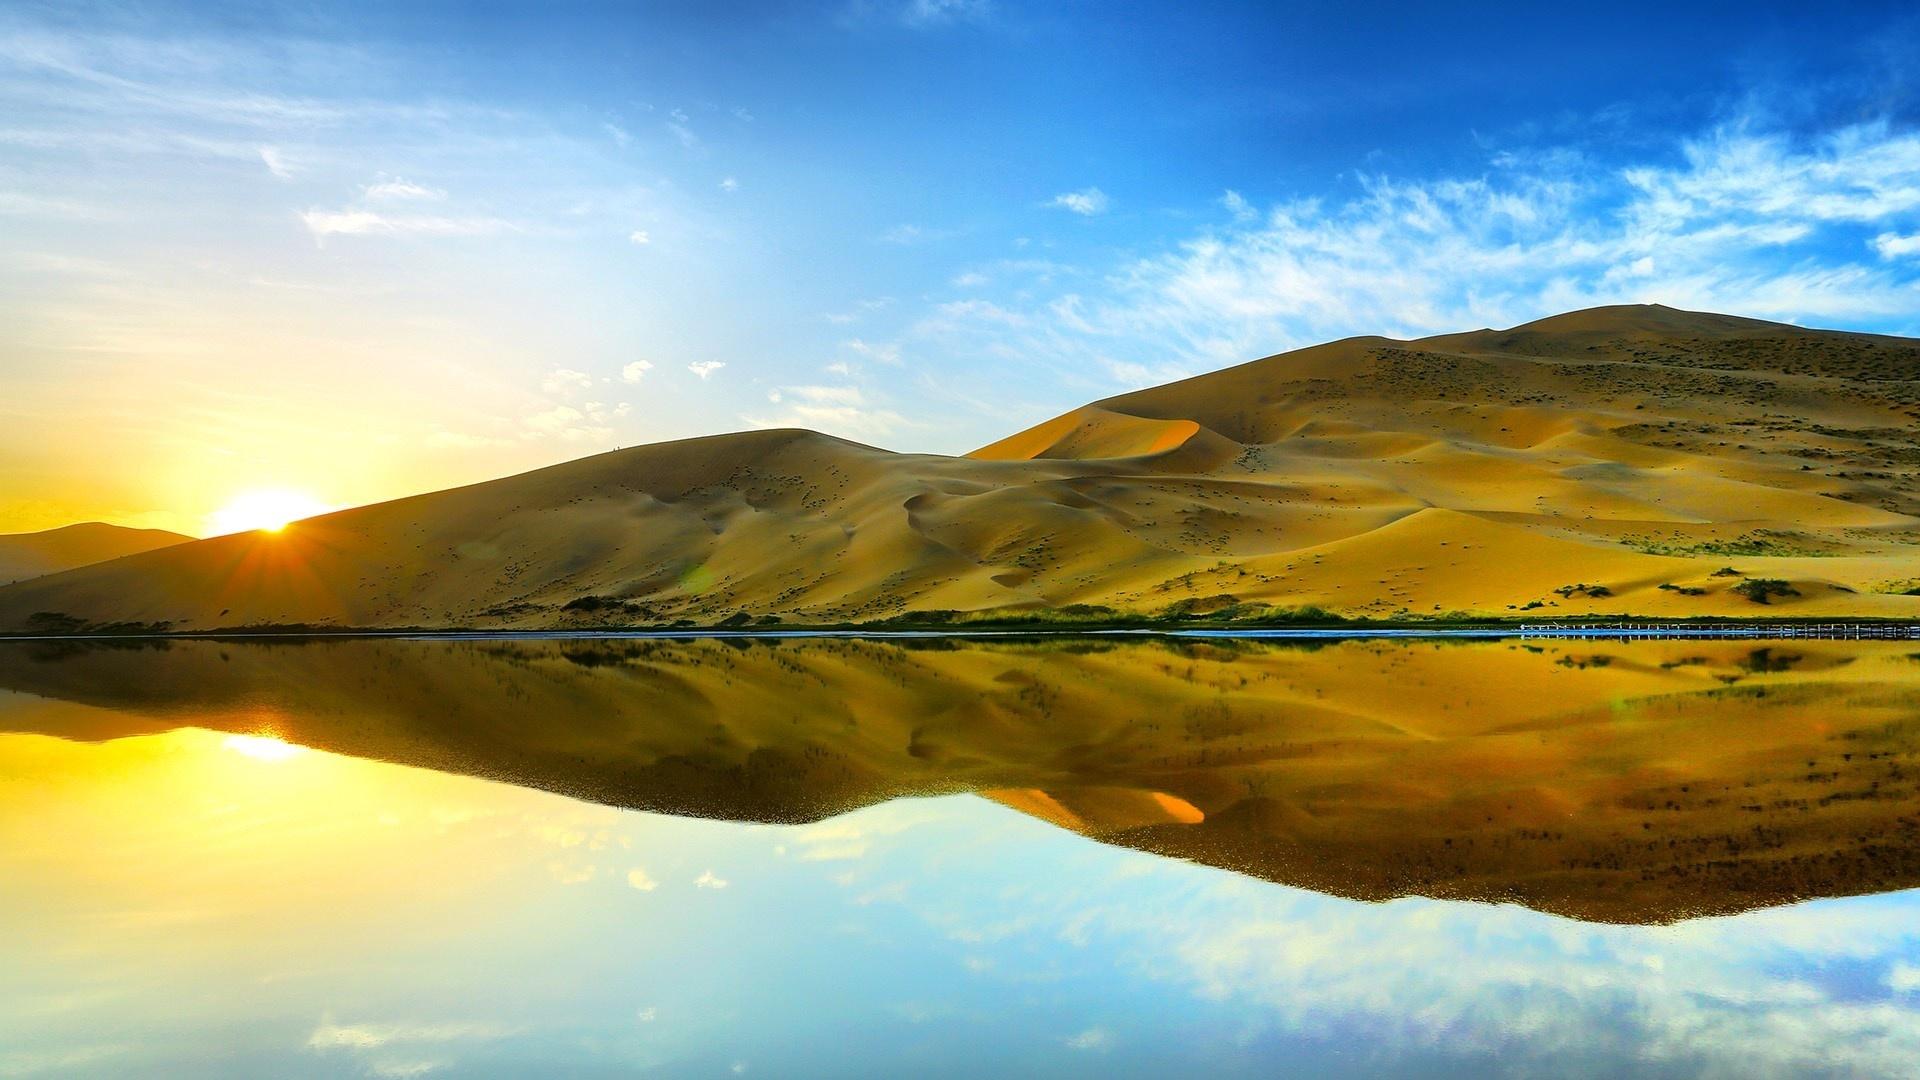 Mongolia Nature desktop wallpaper free download